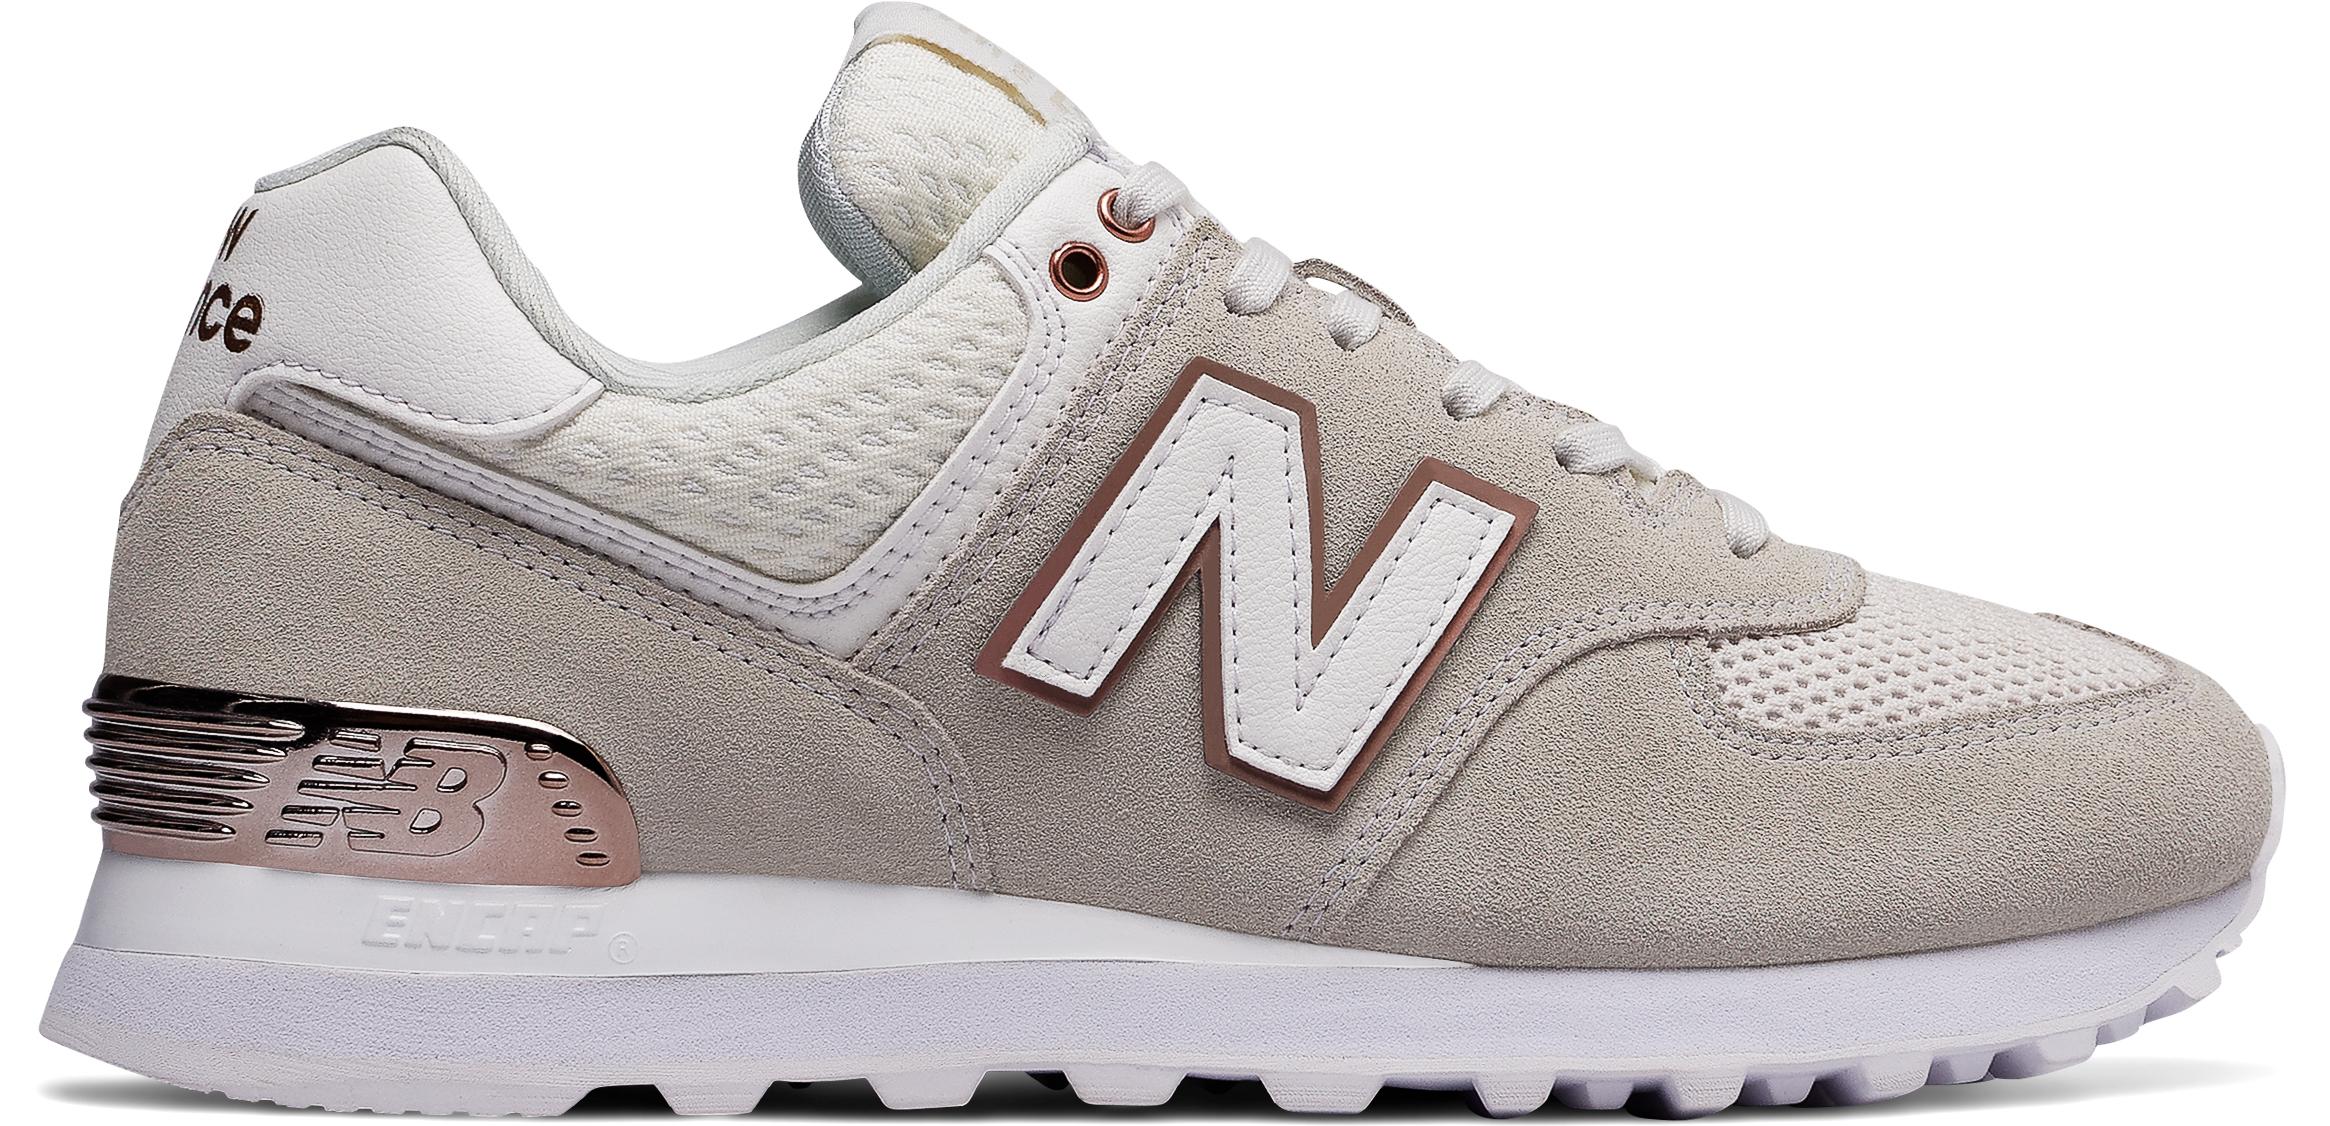 Sneakers And Casual Shoes Sepatu Original Adidas Neo Vl Court Skate Suede Men Core Black